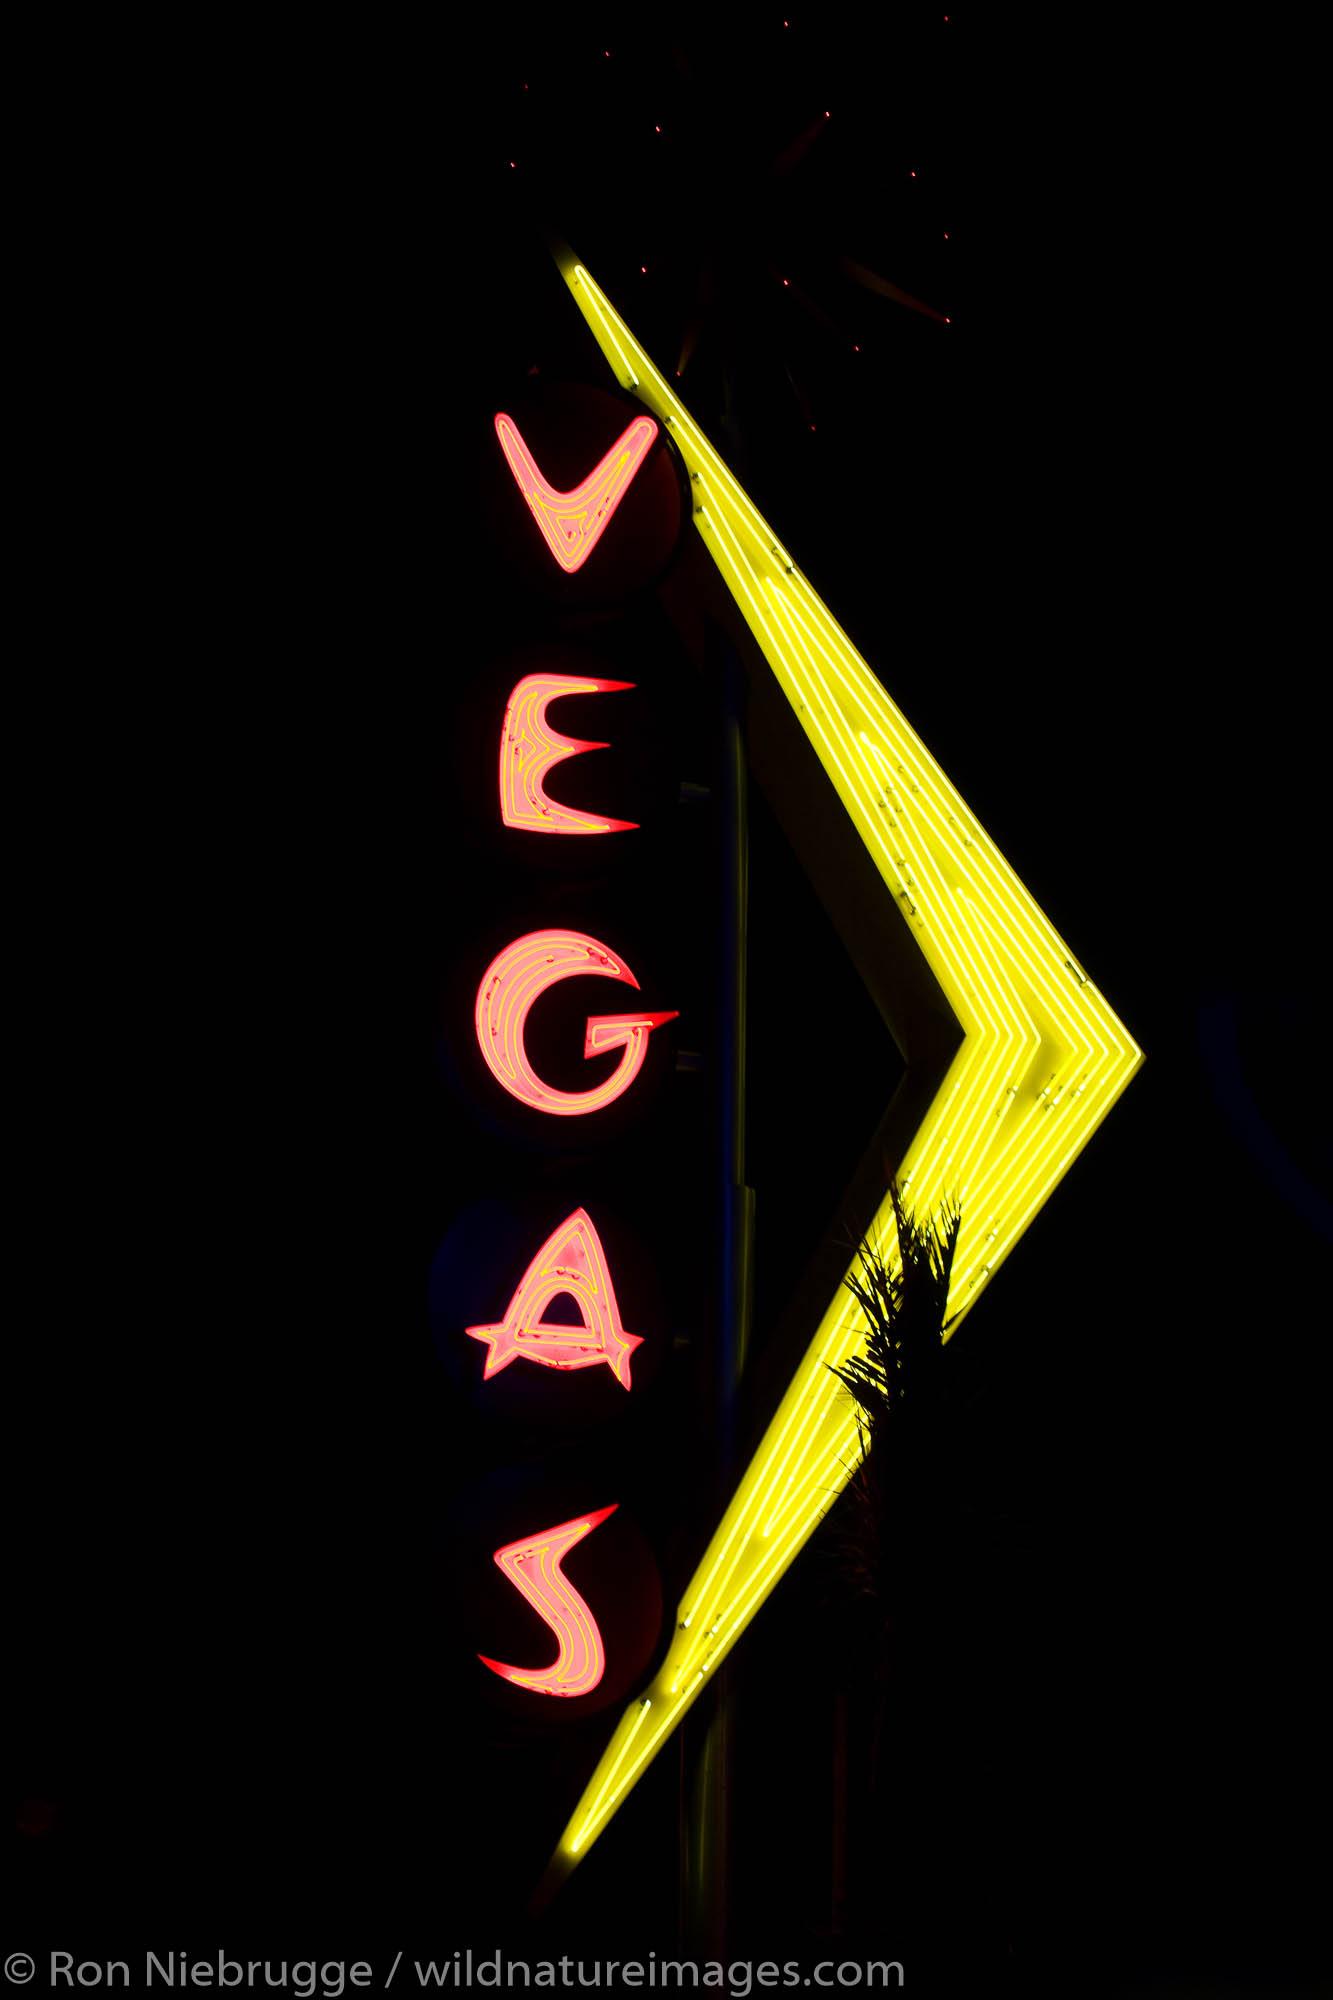 Vegas neon sign, downtown Las Vegas, Nevada.